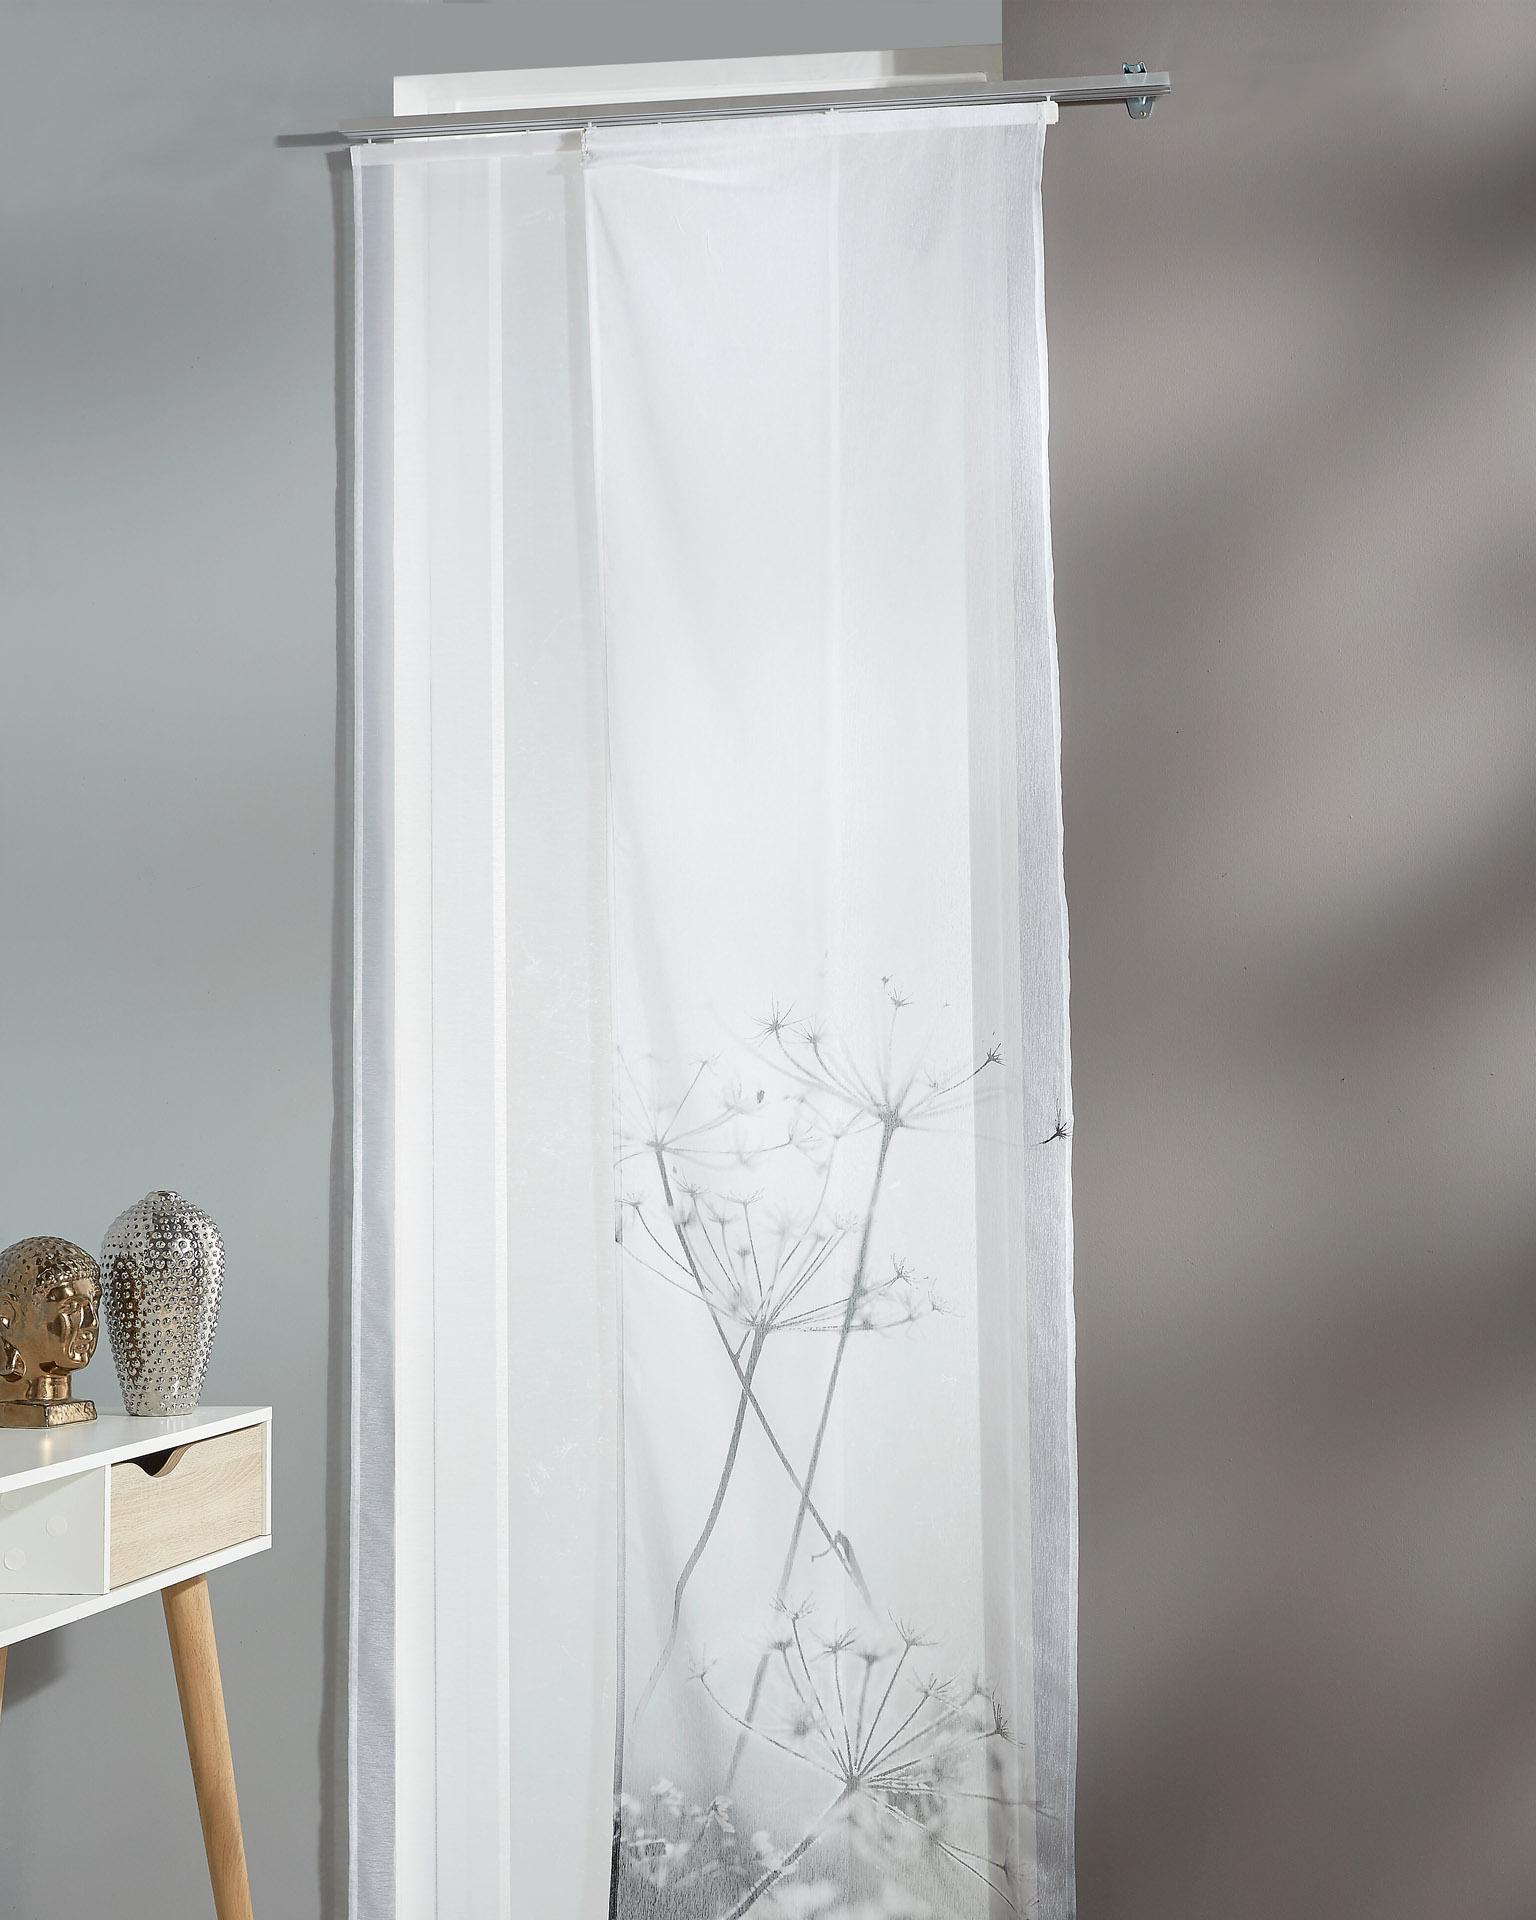 Flächenvorhang Pusteblume (60x245, 2er-Set, weiß)